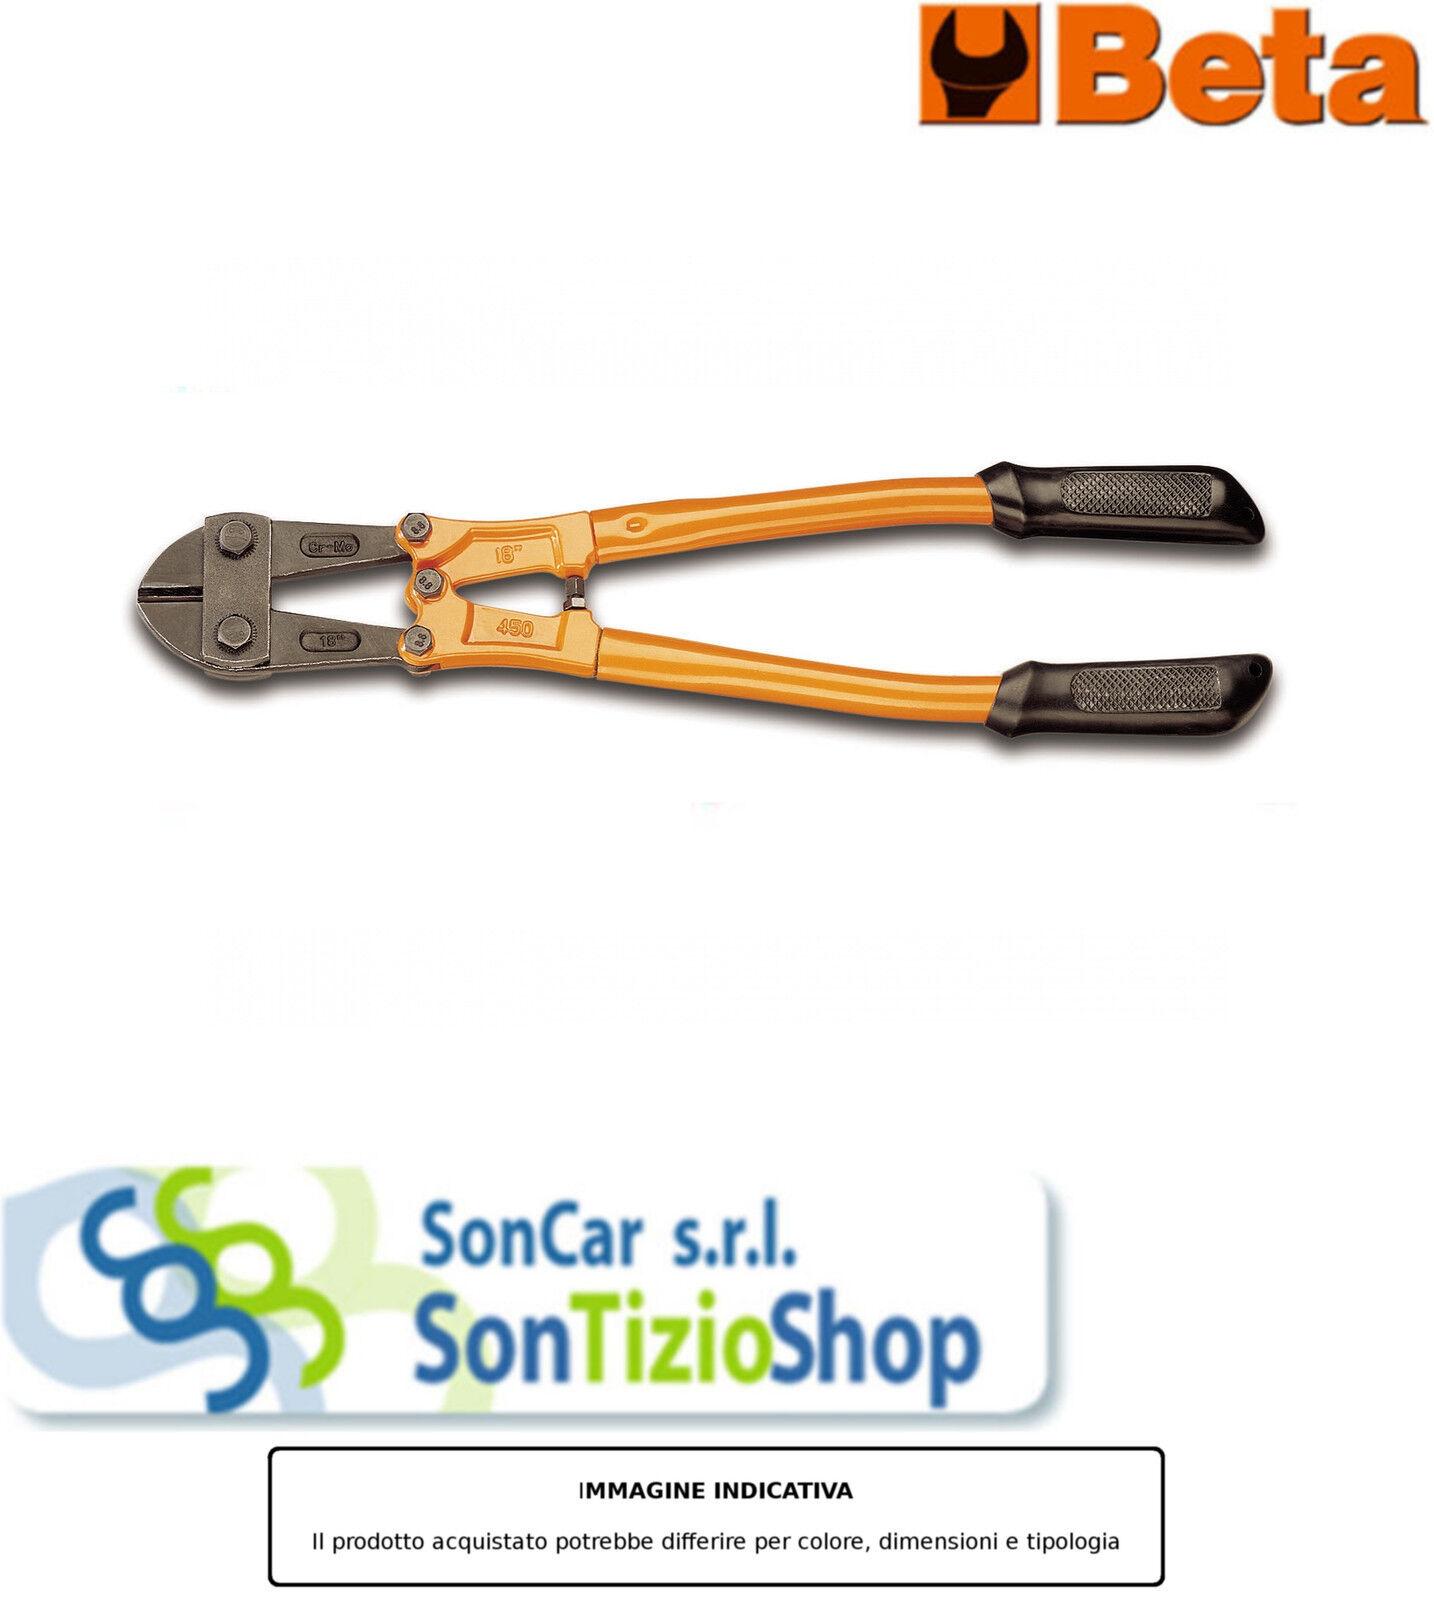 BETA 1101 350 Artikel Original  Bolzenschneider 350